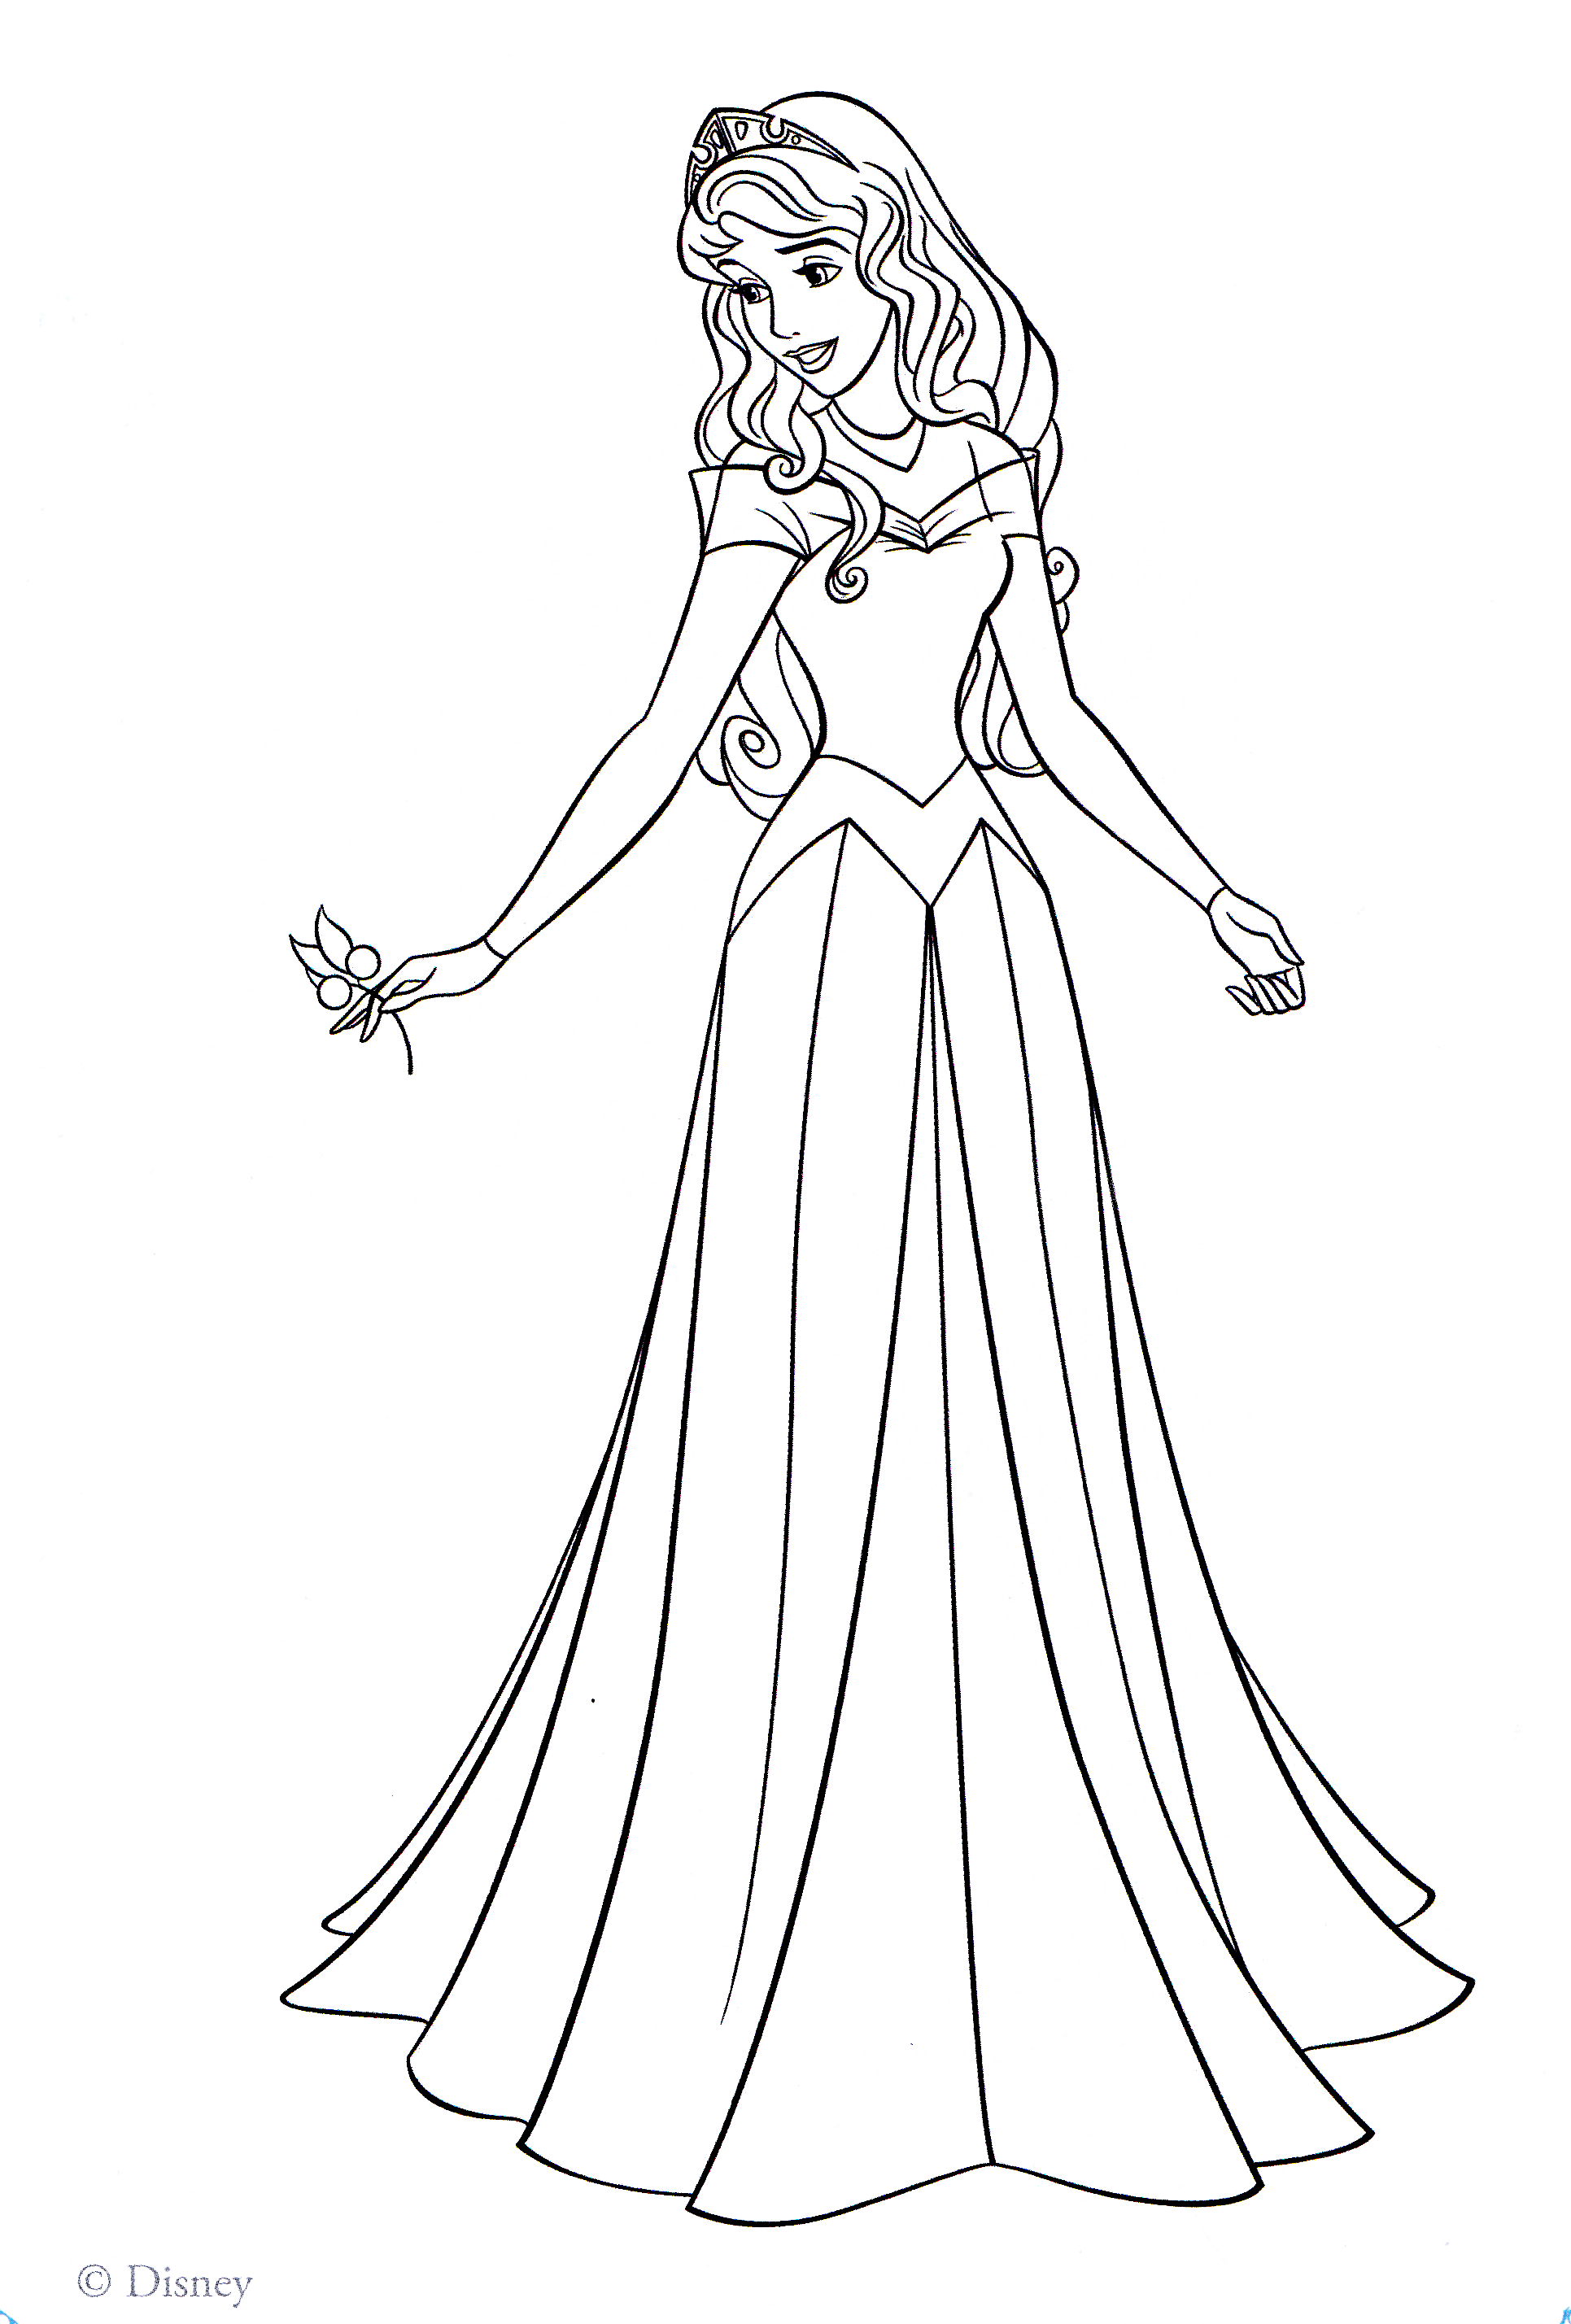 1931x2857 Aurora Coloring Pages Coloringsuite Com And Princess Qqa Me